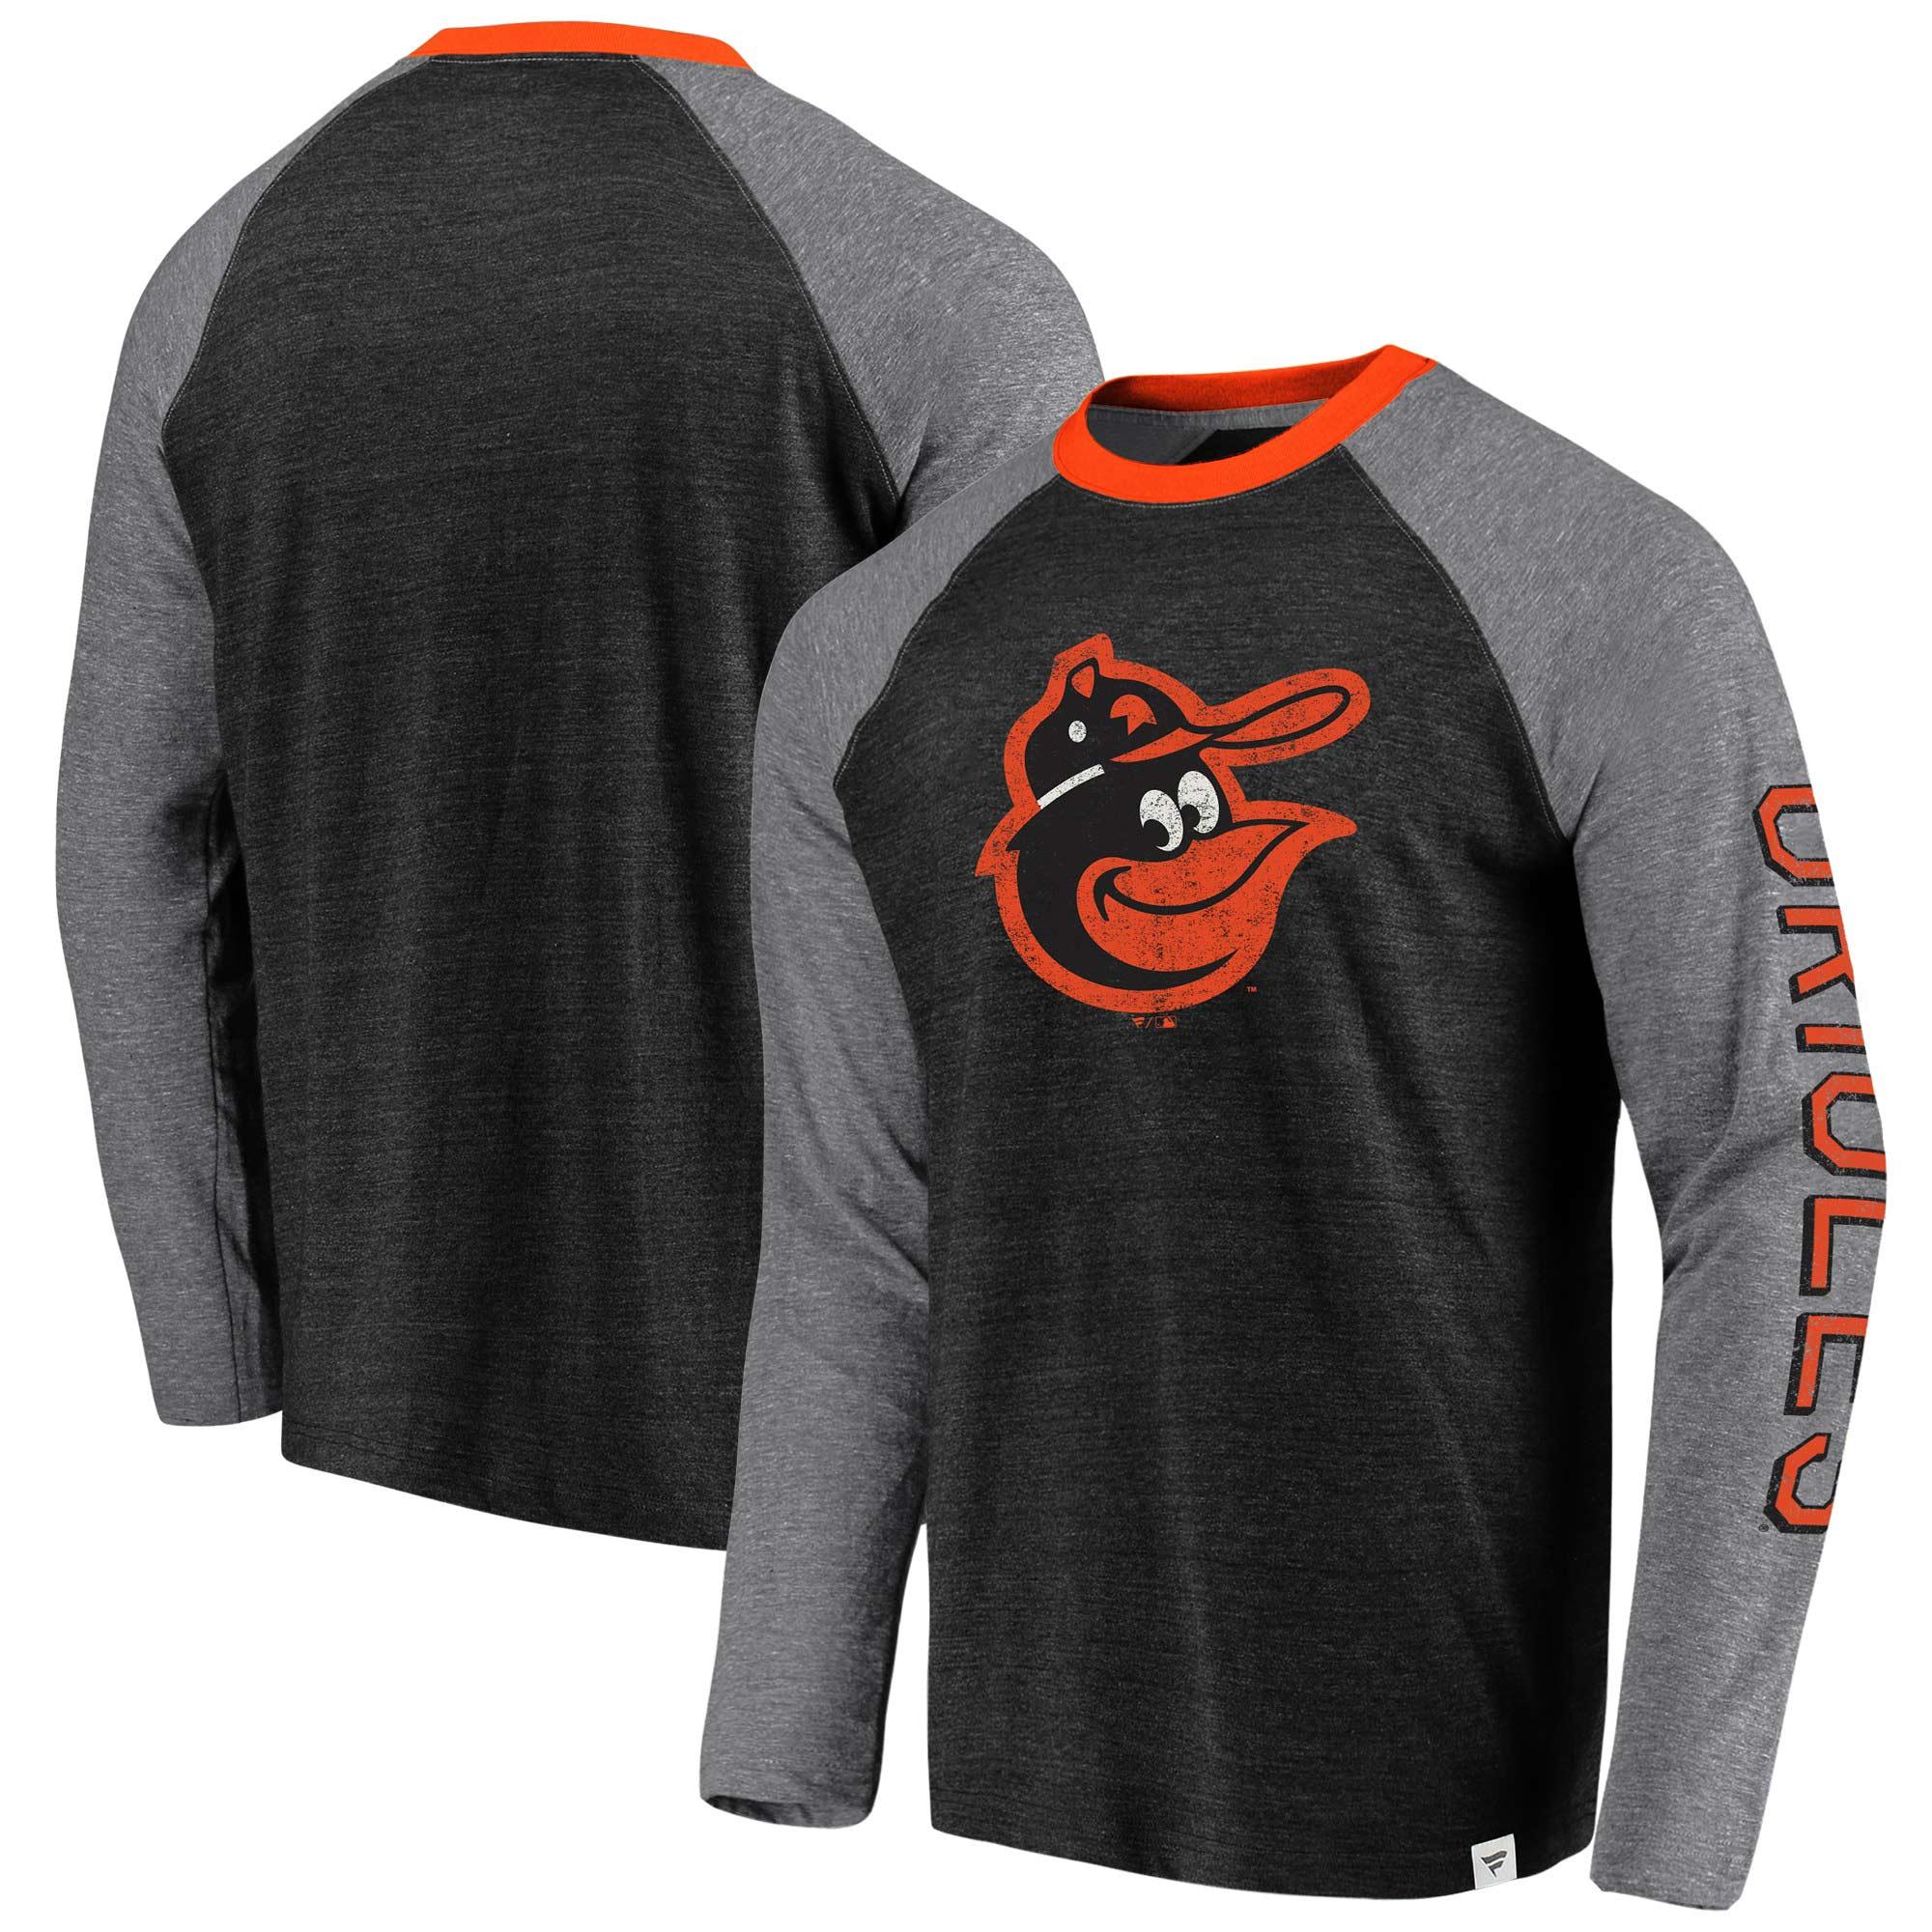 Baltimore Orioles Fanatics Branded True Classics Long Sleeve Raglan T-Shirt - Black/Gray